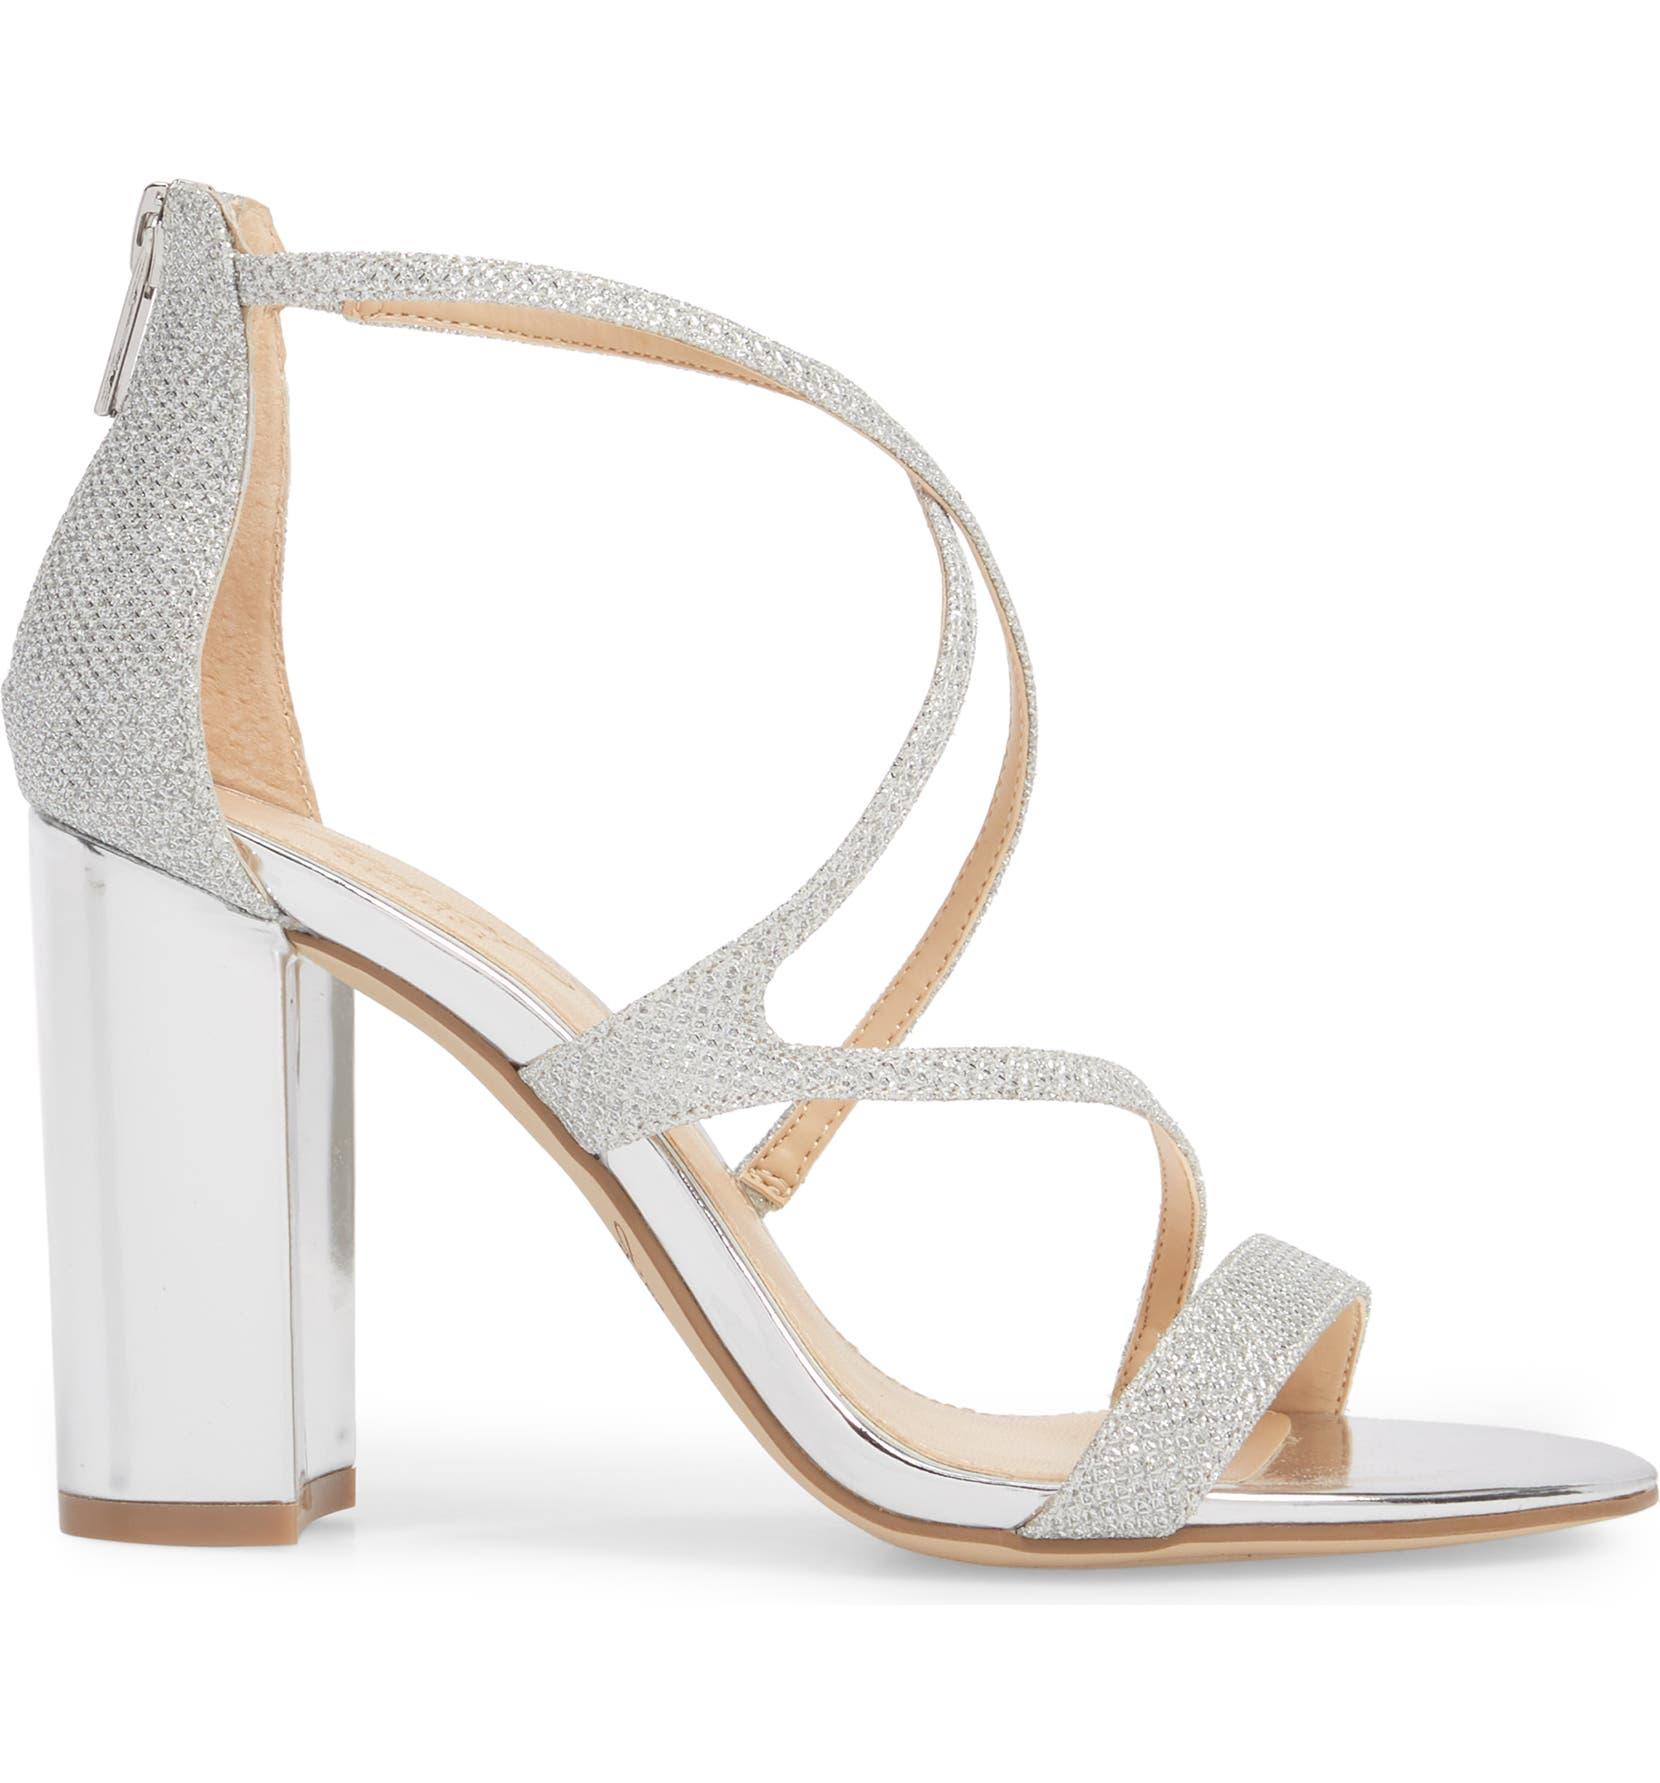 e905368d17e Badgley Mischka Gale Block Heel Sandal (Women)